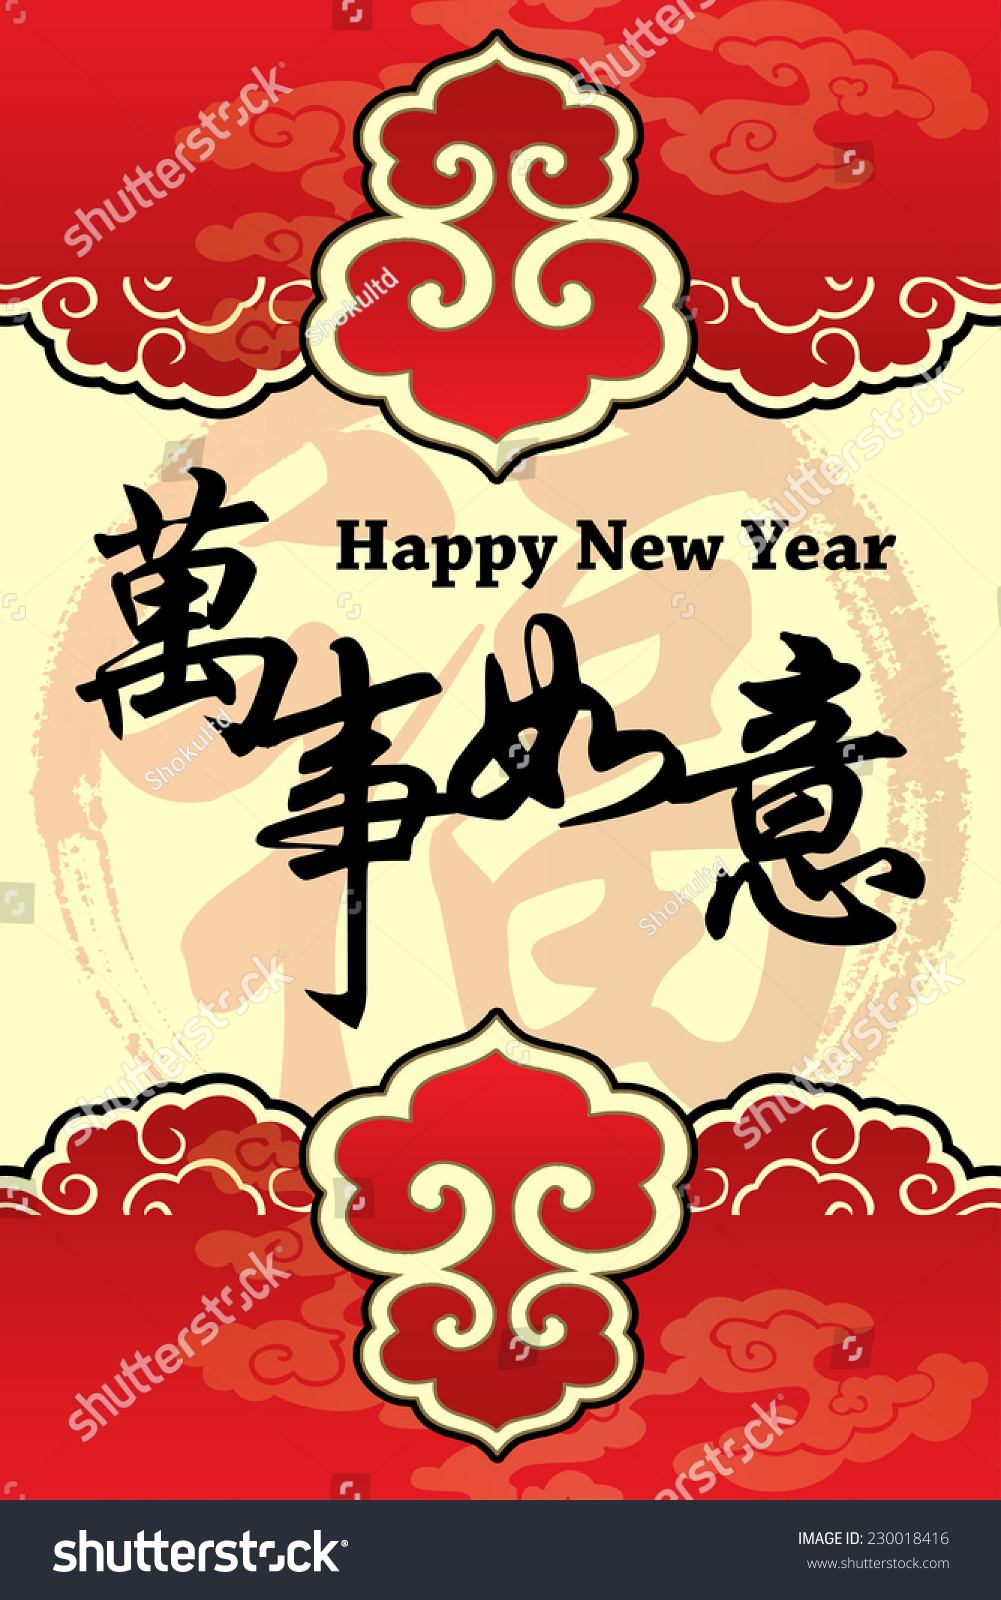 Chinese New Year Greeting Card Design Translation Stock Illustration